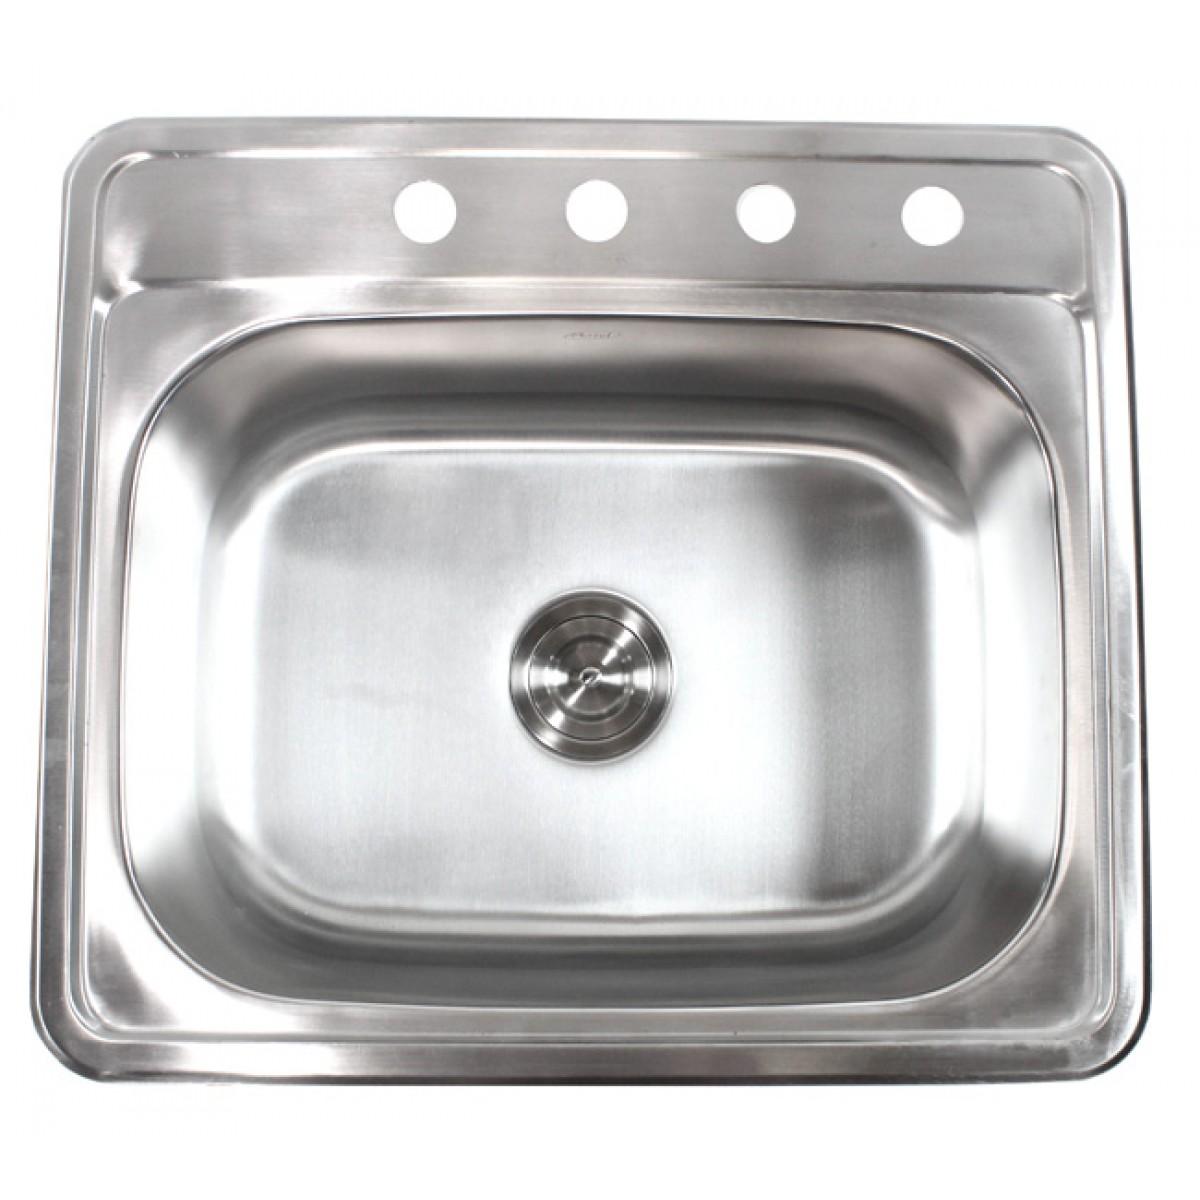 25 inch top mount drop in stainless steel kitchen island bar sink 18 gauge